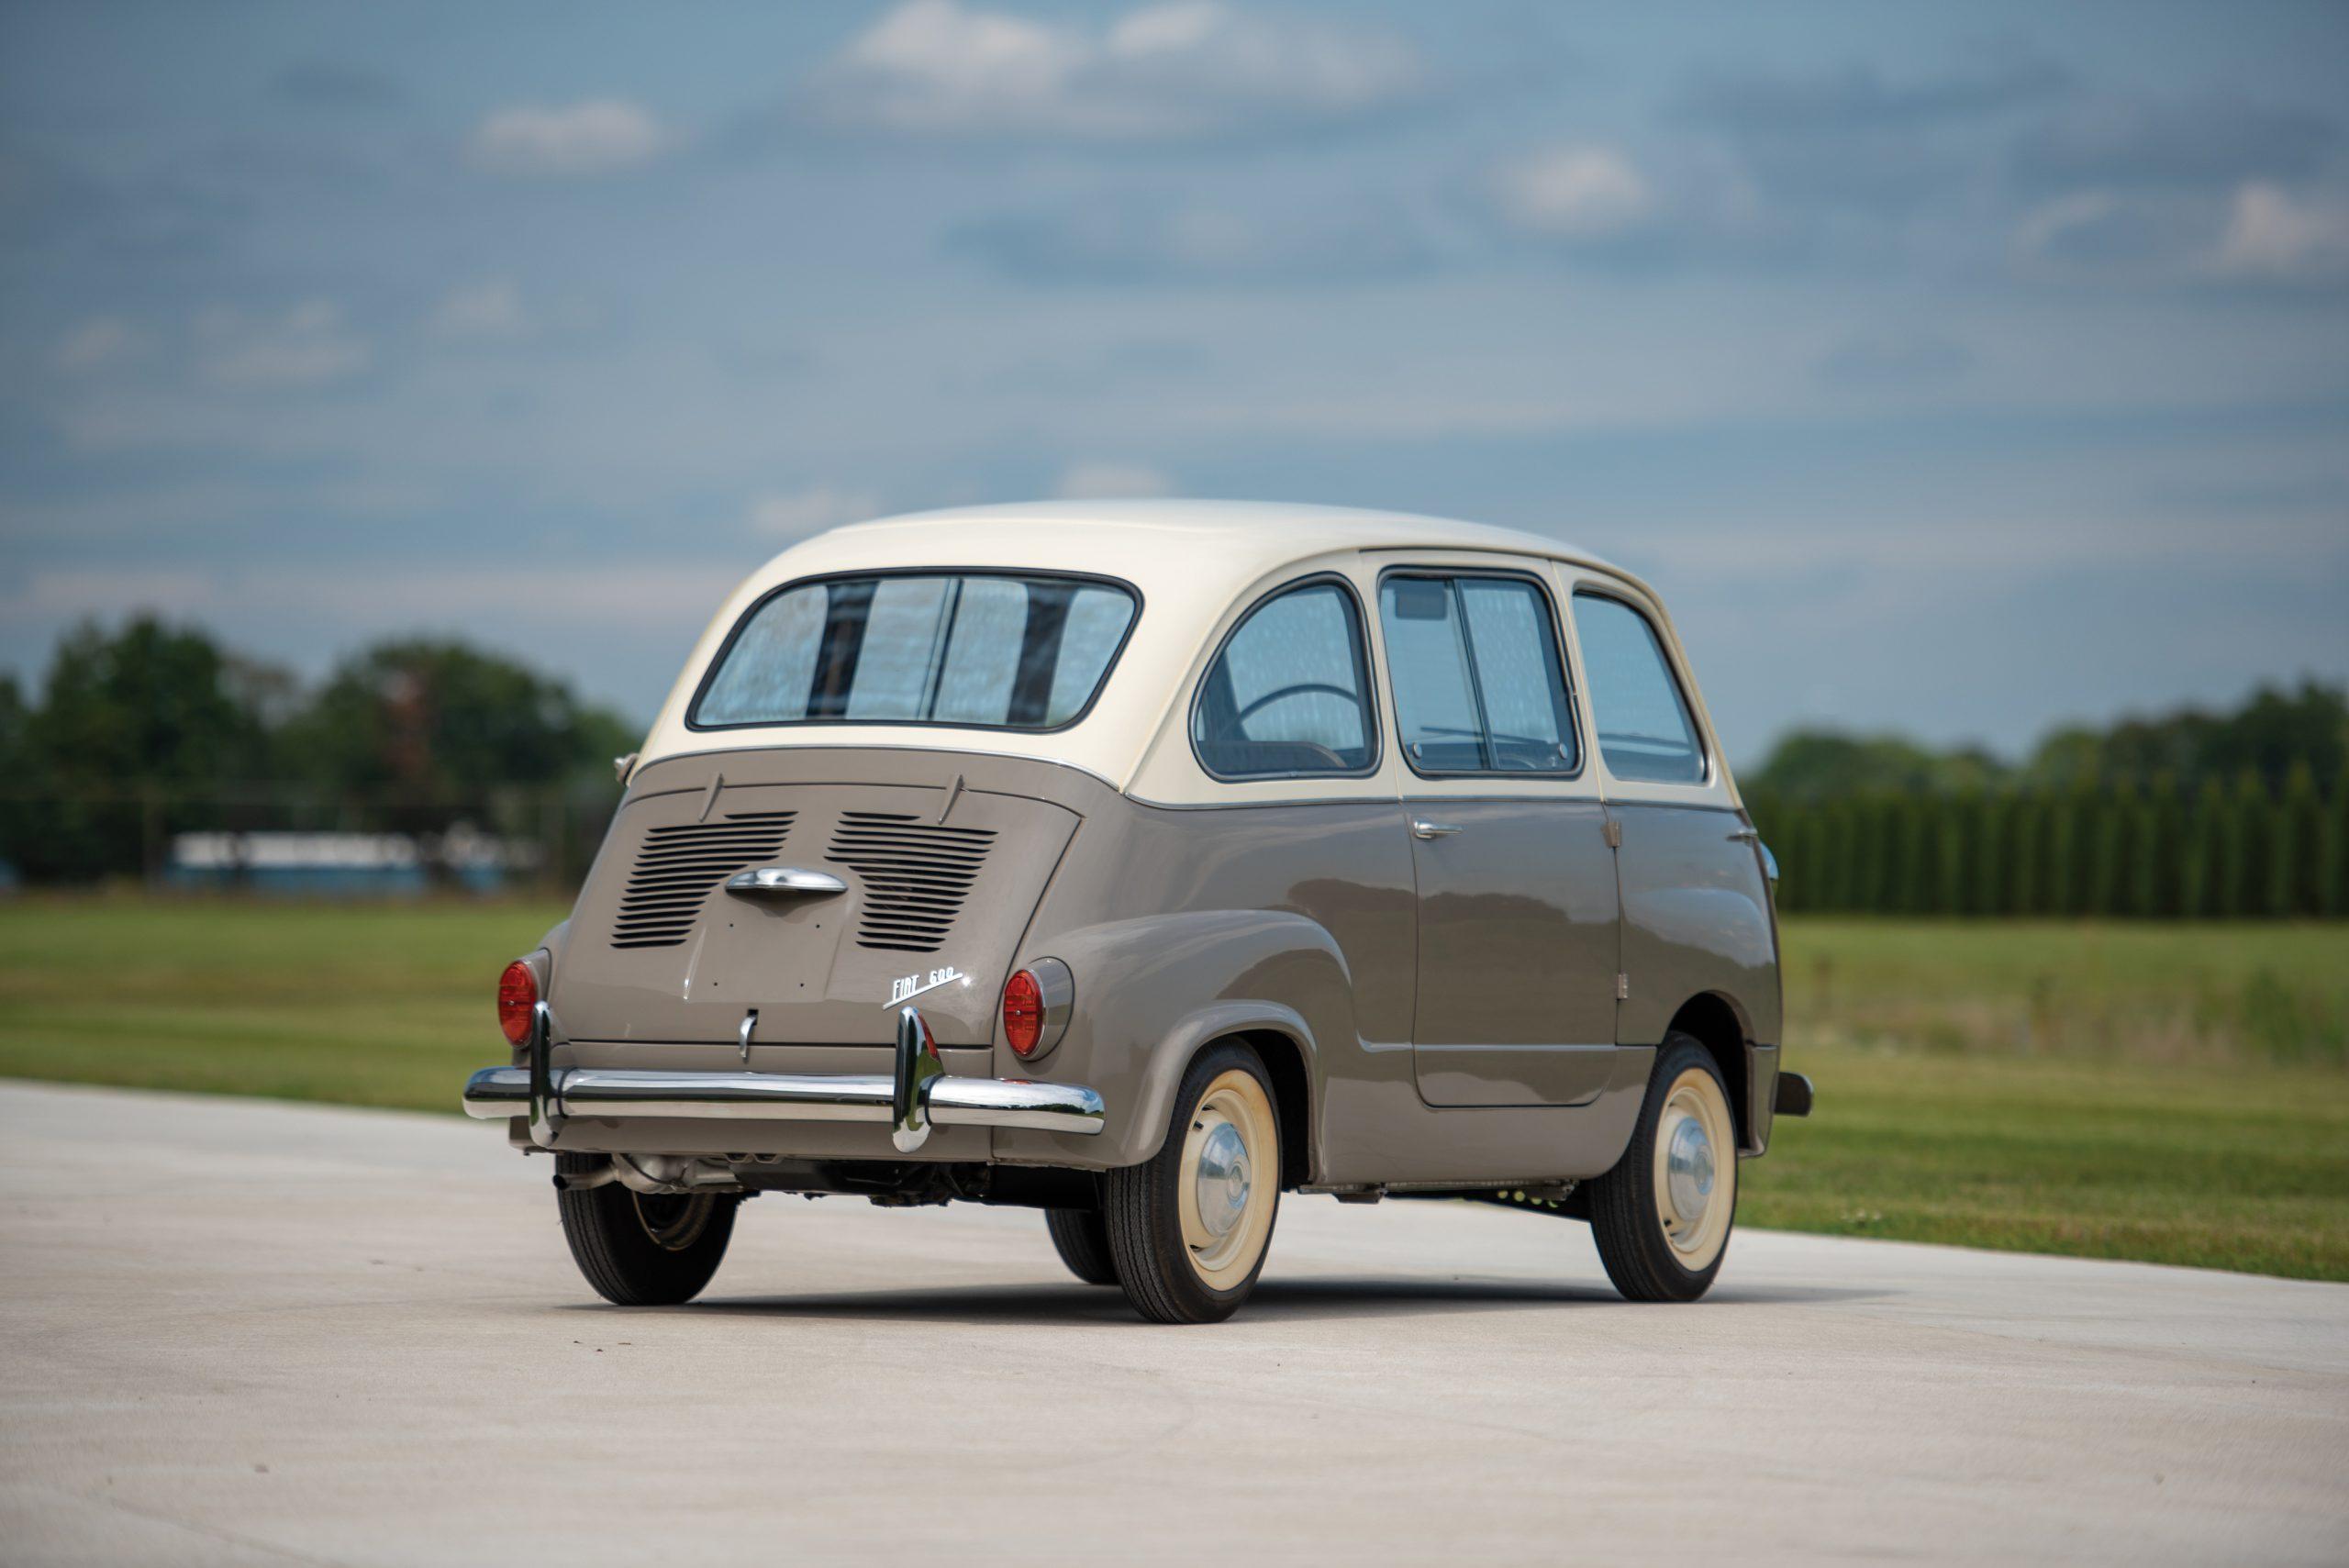 1958 Fiat 600 Multipla rear three-quarter